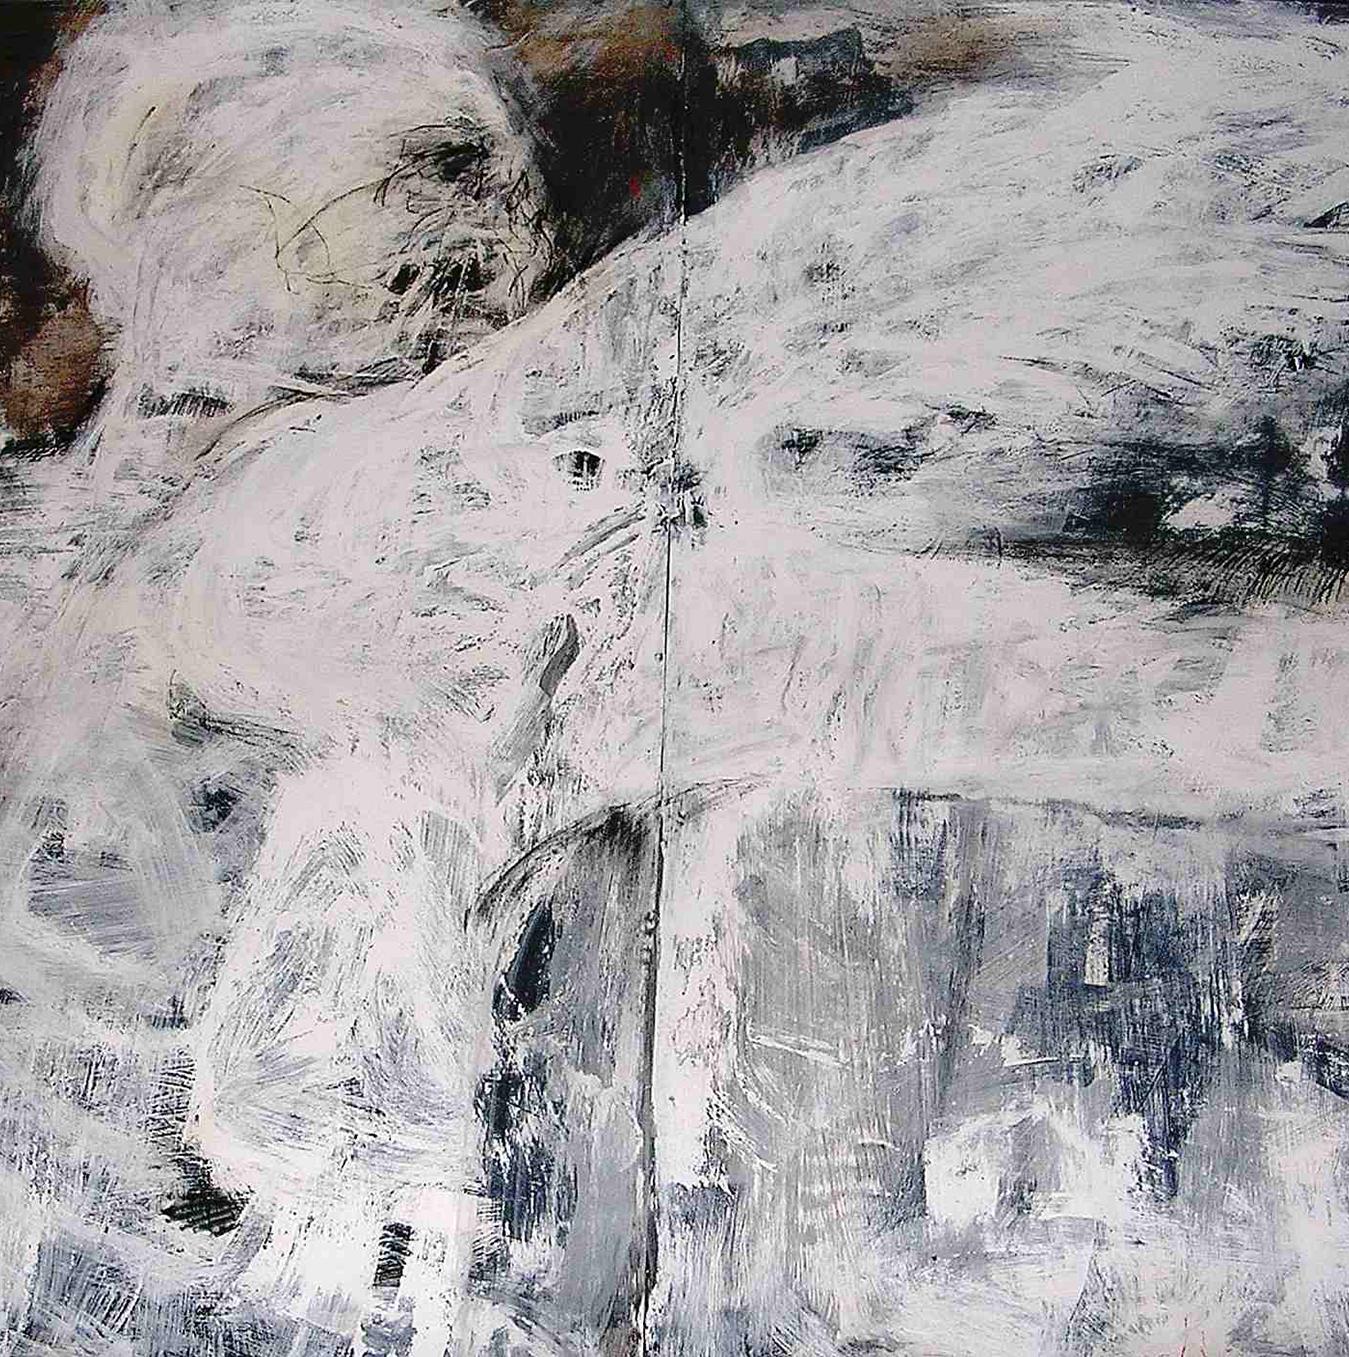 SHEBA SHARROW, Winged Warrior, 1986, 56 x 84 in , mixed media on arches paper, $18,000